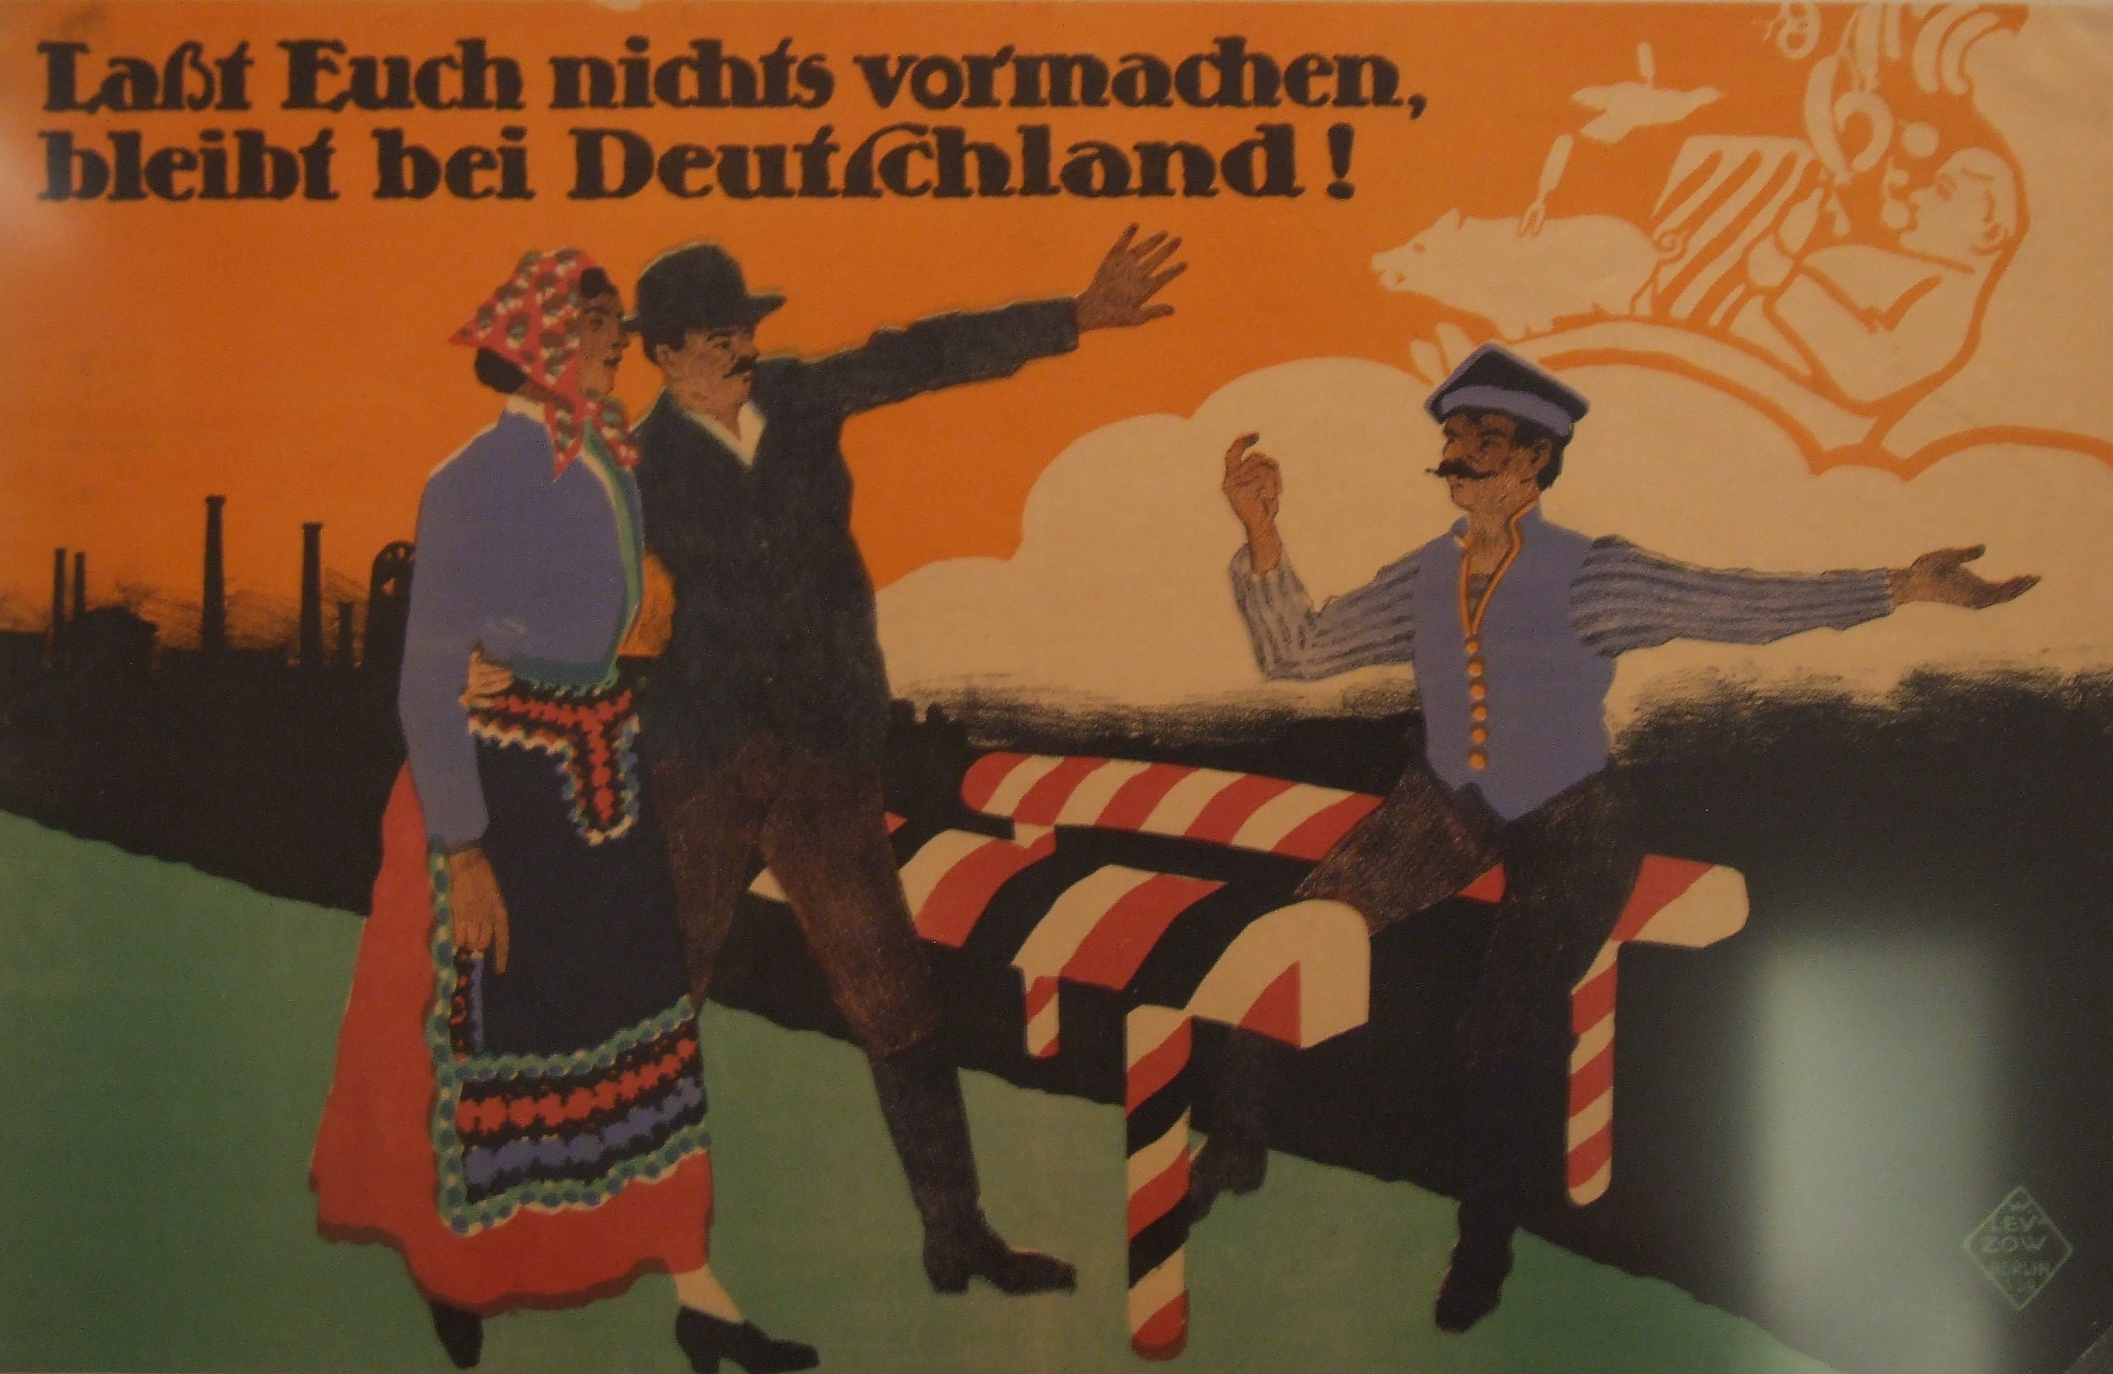 [Image: DHM_-_German_poster%2C_Upper_Silesia_1921.jpg]